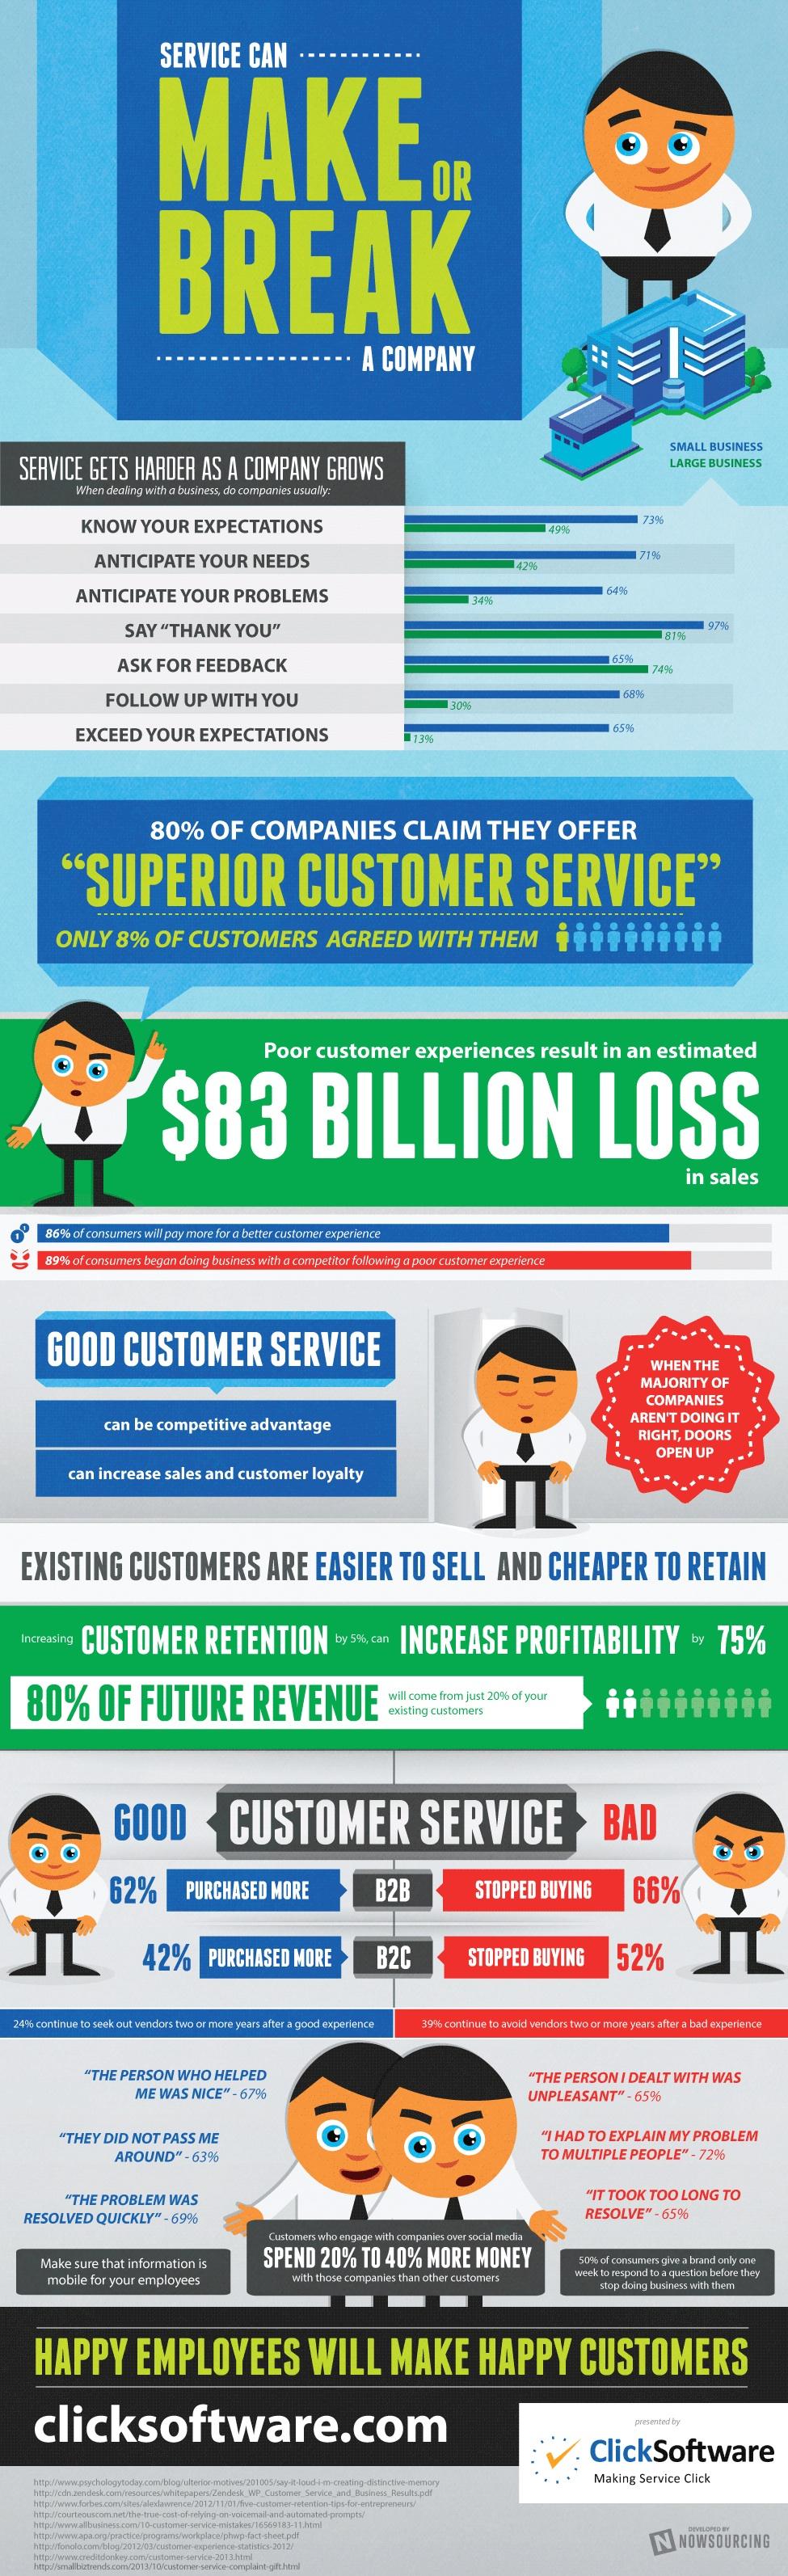 Service Can Make or Break a Company